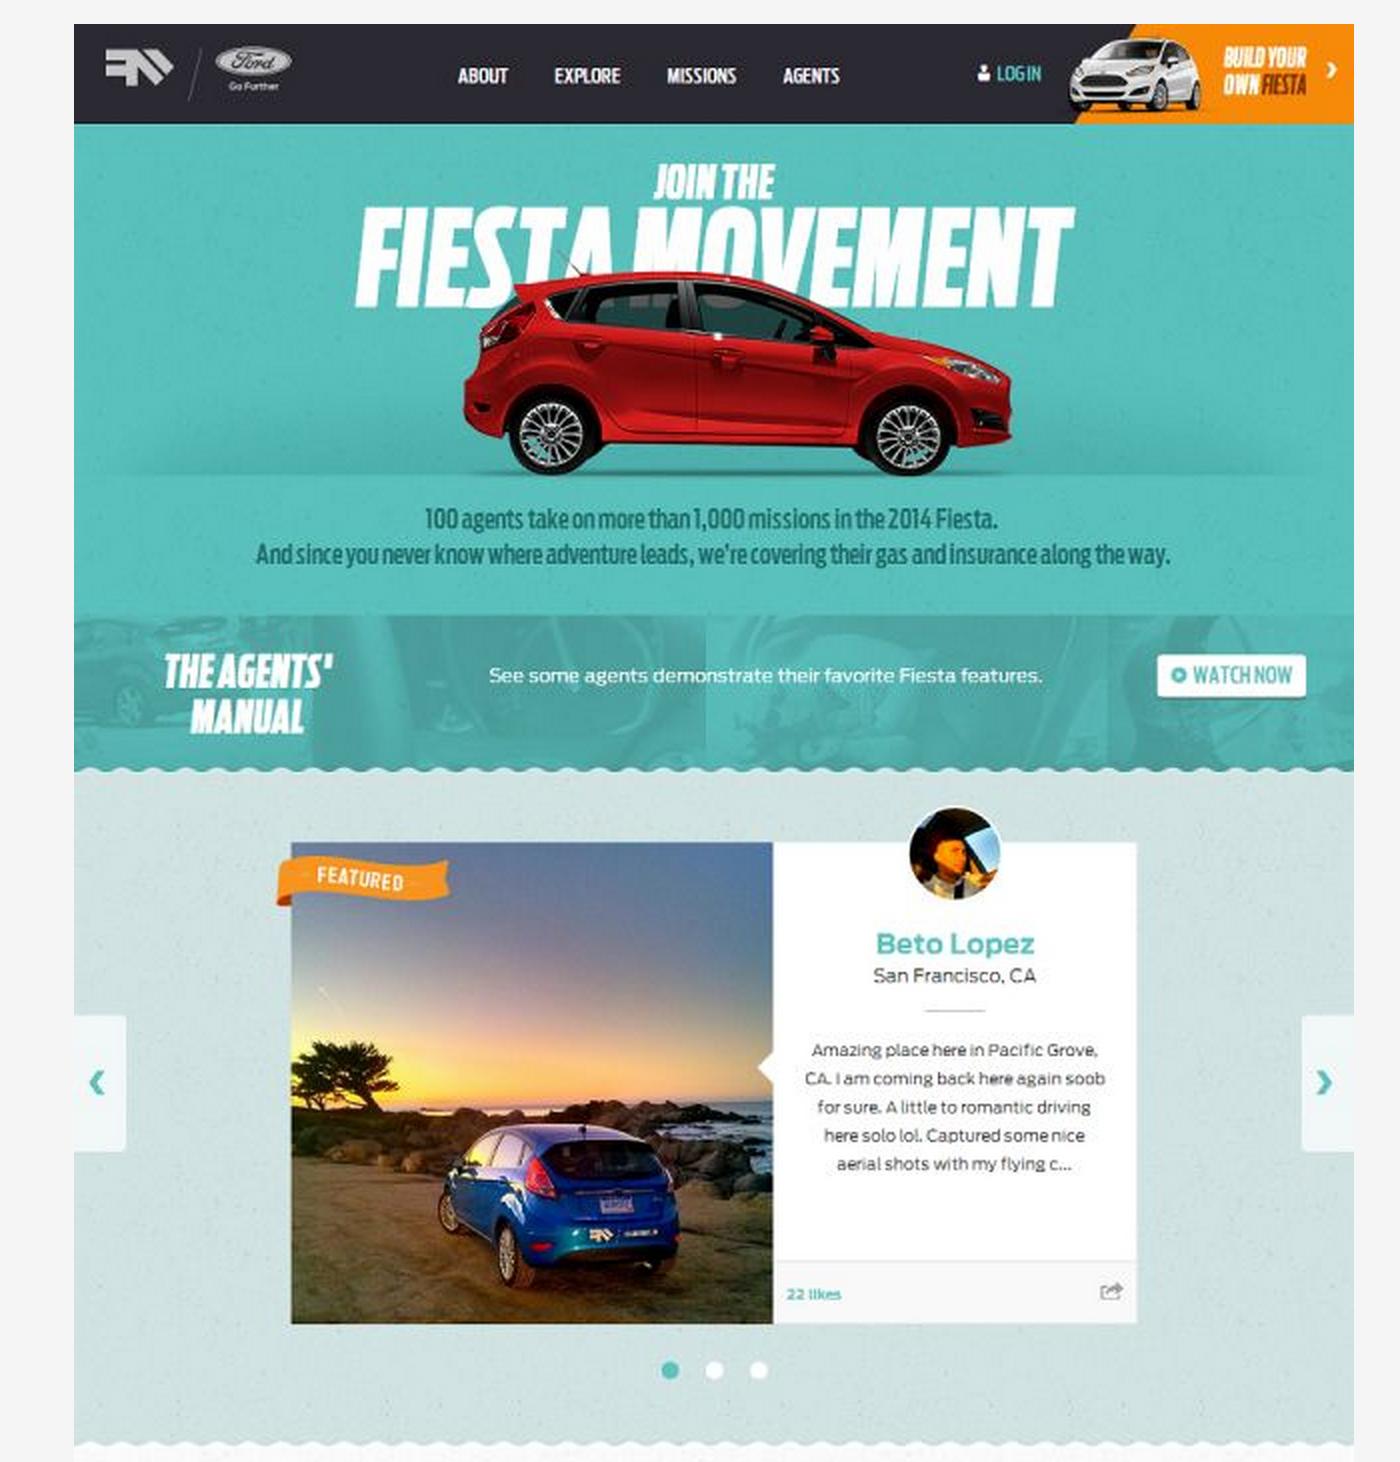 http://cssbased.com/showcase/10790/the-fiesta-movement